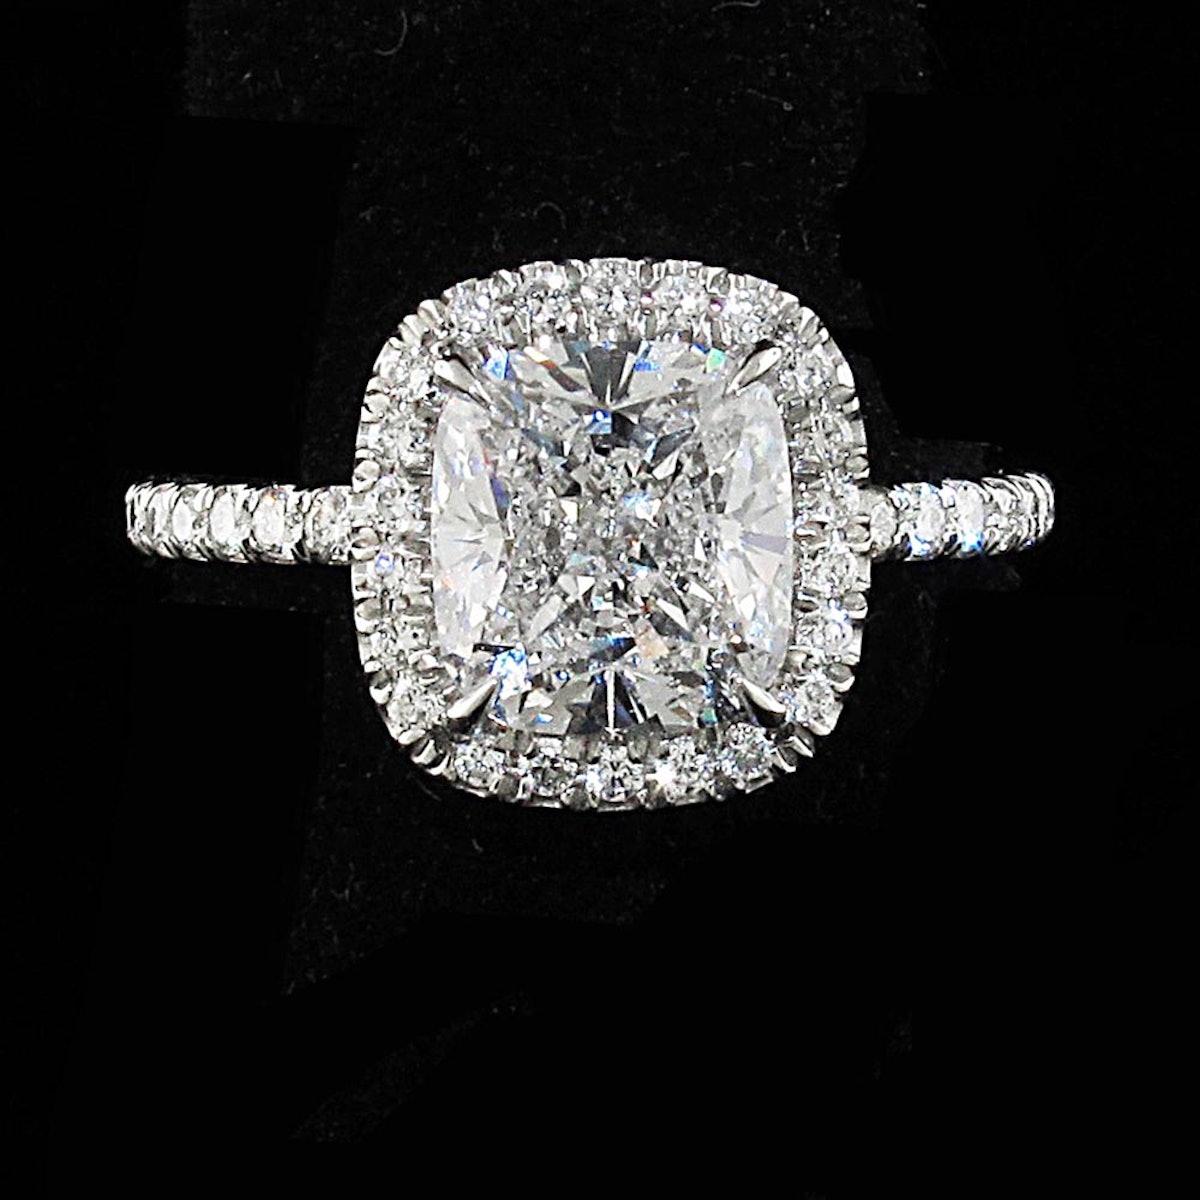 2.13 Carat Diamond Engagement Ring from Kantor Gems.